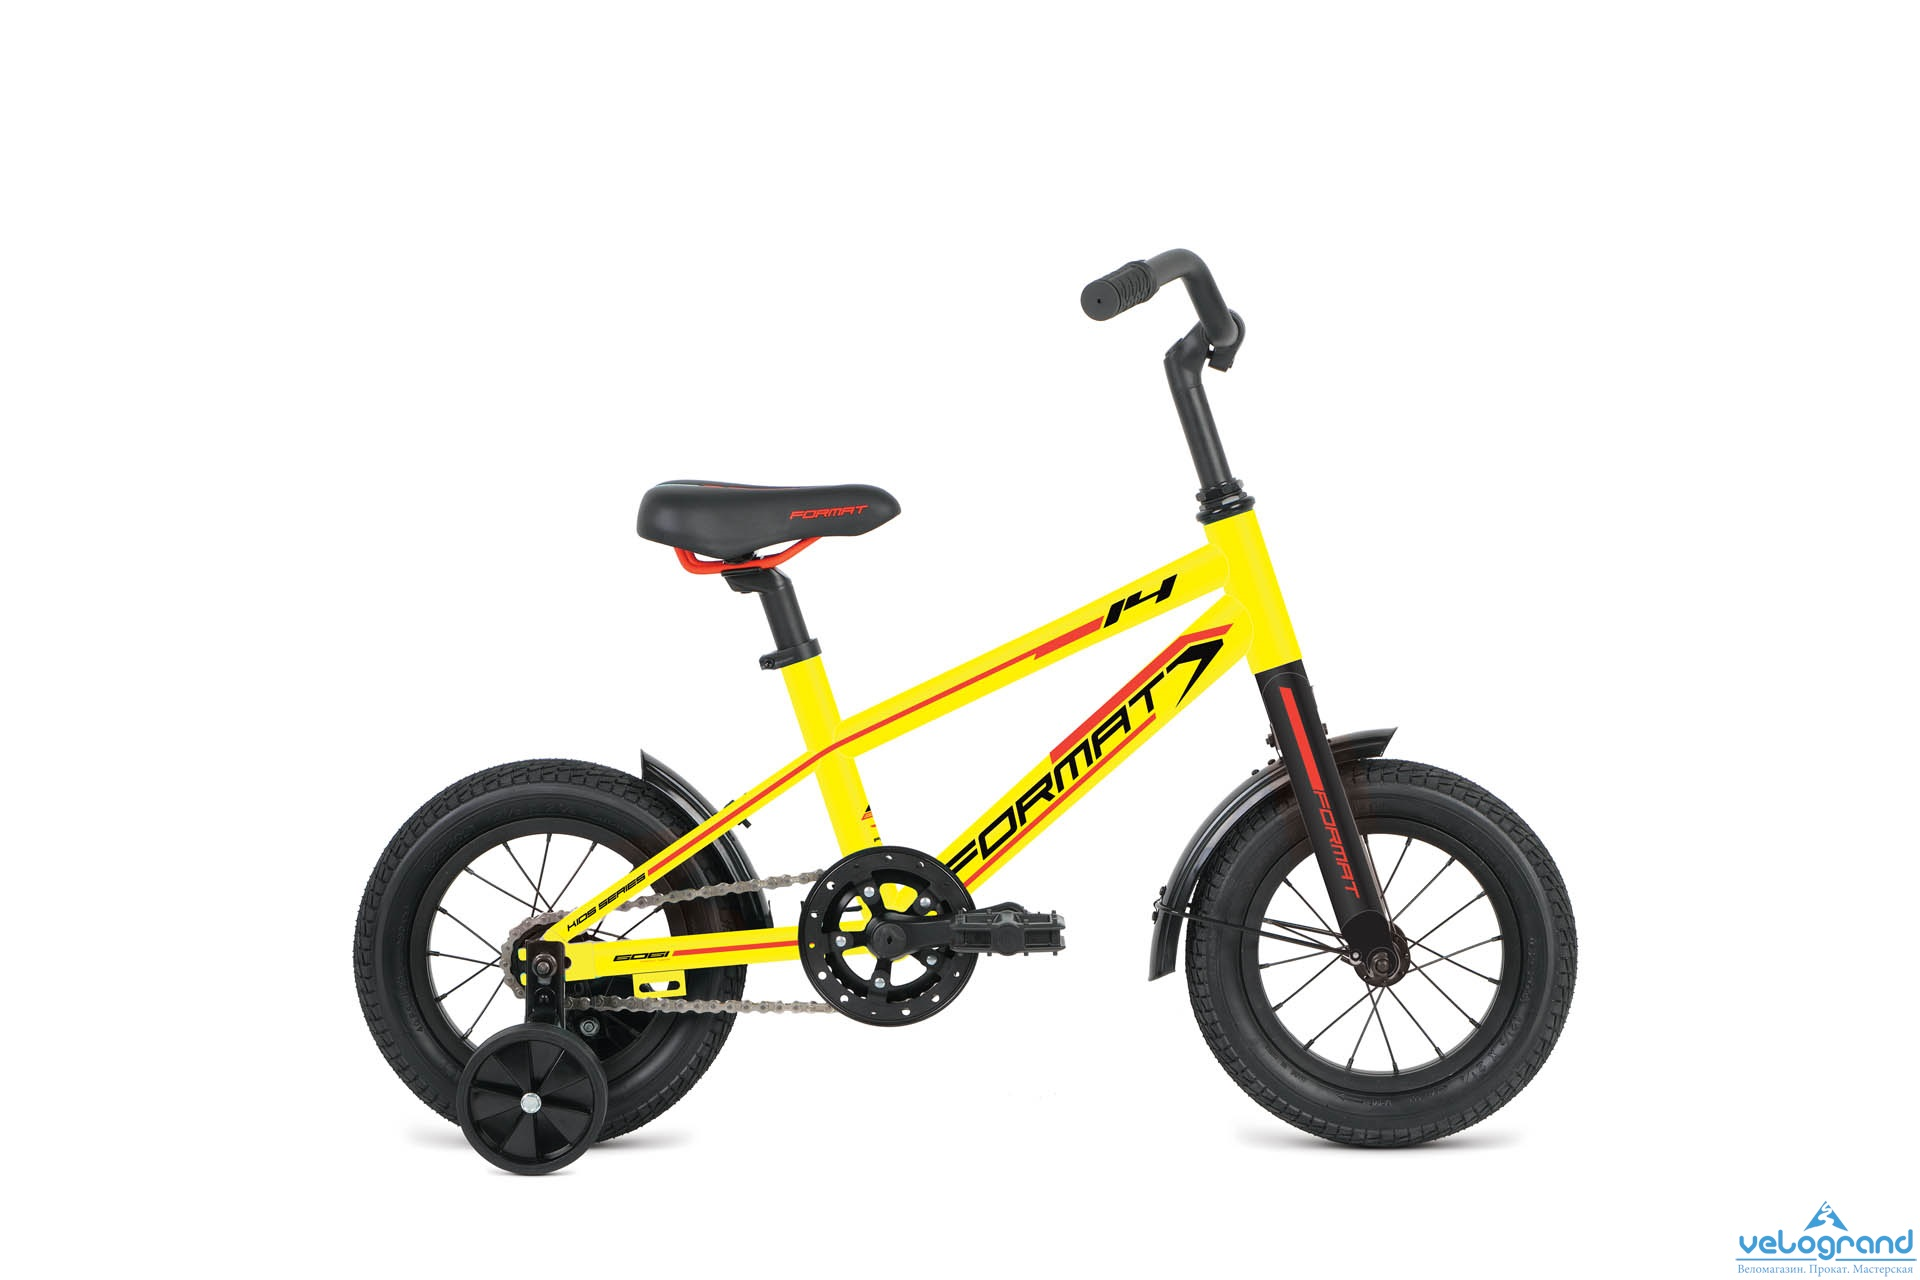 Детский велосипед Format Boy 14 (2016)Модельный год<br>2016<br><br><br>Пол<br>Мужской / женский<br><br><br>Возрастная группа<br>Для детей<br><br><br>Вес<br>7.6 кг.<br><br><br><br><br><br><br><br>Рама<br> <br><br><br><br>Материал рамы<br>Алюминий<br><br><br><br>Рама<br>14, Children, 6061<br><br><br><br>Ростовка рамы<br>one size<br><br><br><br><br><br><br><br>Амортизация<br> <br><br><br><br>Тип амортизации<br>Жесткая вилка<br><br><br><br>Вилка<br>Al 6061<br><br><br><br><br><br><br><br>Управление<br> <br><br><br><br>Седло<br>Format VL-5020, steel rails<br><br><br><br>Подседельный штырь<br>Format SP-C208, 27.2mm<br><br><br><br>Рулевая колонка<br>Neco, external cup threaded headset, 25.4x34x30<br><br><br><br>Вынос руля<br>Format HA-C40-5, 30&amp;infin;, diameter: 25.4mm<br><br><br><br>Руль<br>Format HB-102-1, raise bar, width: 480mm, backsweep: 26&amp;infin;, rise: 60mm, diameter: 25.4mm<br><br><br><br><br><br><br><br>Тормозная система<br> <br><br><br><br>Тормоза<br>coaster brake<br><br><br><br><br><br><br><br>Трансмиссия<br> <br><br><br><br>Количество скоростей<br>1x1<br><br><br><br>Каретка<br>Neco B910<br><br><br><br>Система шатунов<br>Samox, 102L, 28T<br><br><br><br>Трещотка / Кассета<br>16T<br><br><br><br>Цепь<br>KMC Z410<br><br><br><br><br><br><br><br>Колеса<br> <br><br><br><br>Втулка передняя<br>Wheelset<br><br><br><br>Втулка задняя<br>Wheelset<br><br><br><br>Материал ободов<br>Aluminium<br><br><br><br>Обода<br>Wheelset<br><br><br><br>Покрышки<br>Kenda K-841 14x2.25<br><br><br><br><br><br><br><br>Дополнительно<br> <br><br><br><br>Педали<br>Plastic<br><br><br><br>Крылья<br>Steel<br><br>Модельный год: 2016<br>Производитель: Format<br>Материал рамы: Алюминий<br>Диаметр колес: 14 дюймов<br>Количество скоростей: 1 скорость<br>Возраст: От 3 до 5 лет<br>Тип тормозов: Ножной<br>Страна: Россия<br>Количество колес: 4 колеса<br>Наличие ручки: без ручки